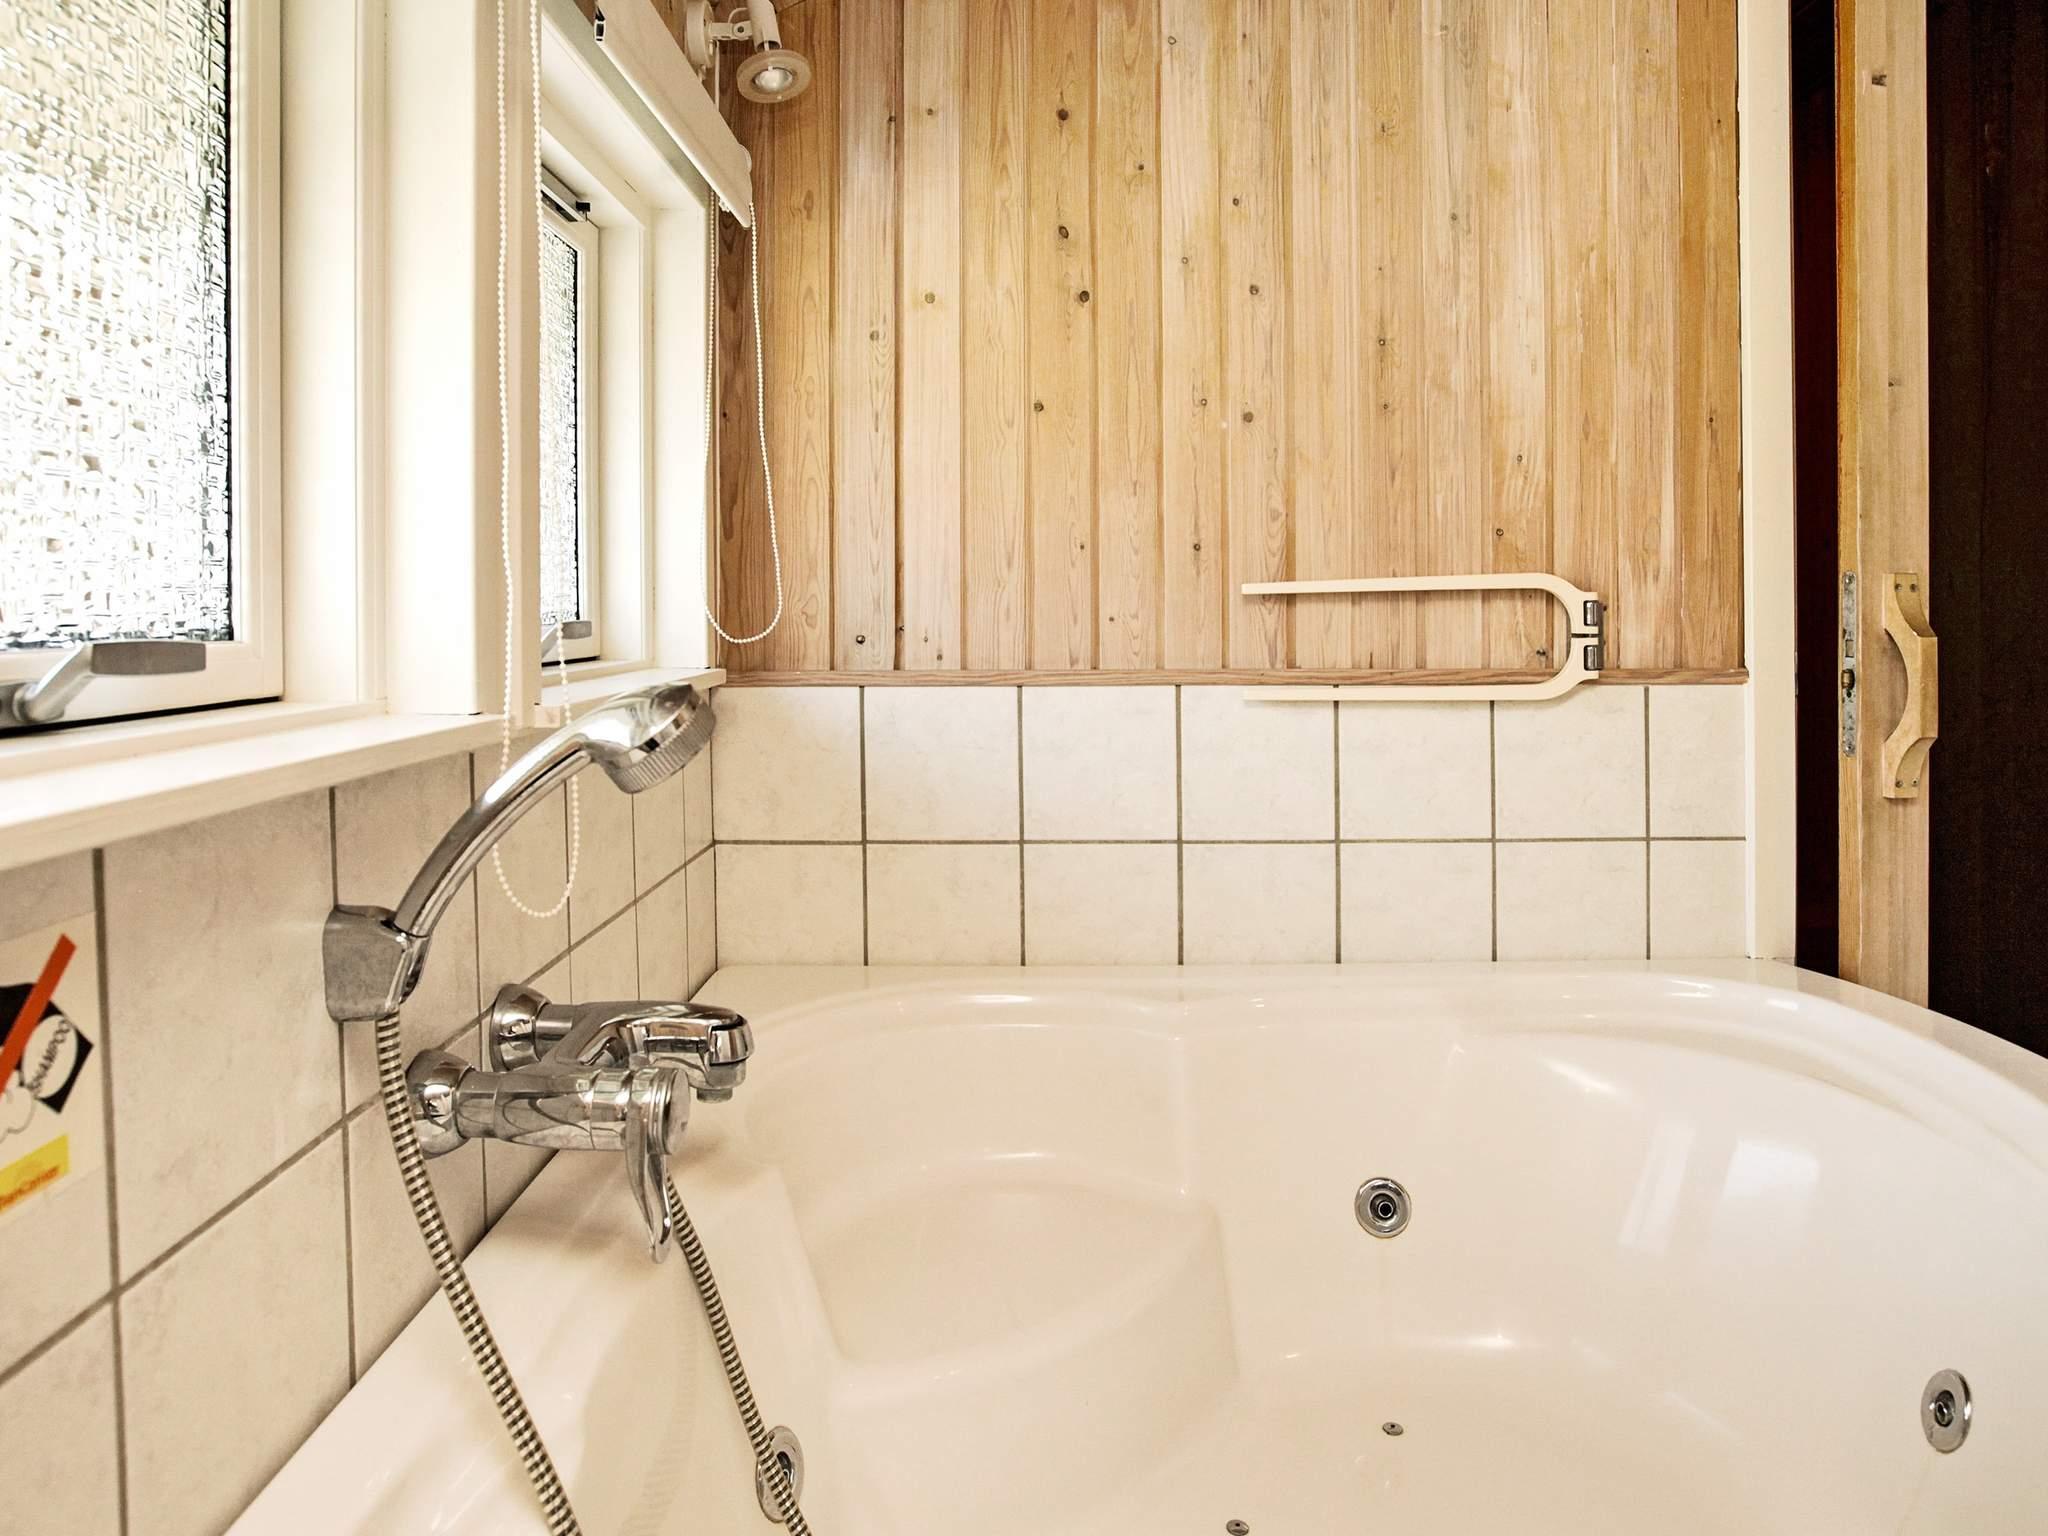 Maison de vacances Falsled (87545), Faldsled, , Fionie, Danemark, image 21